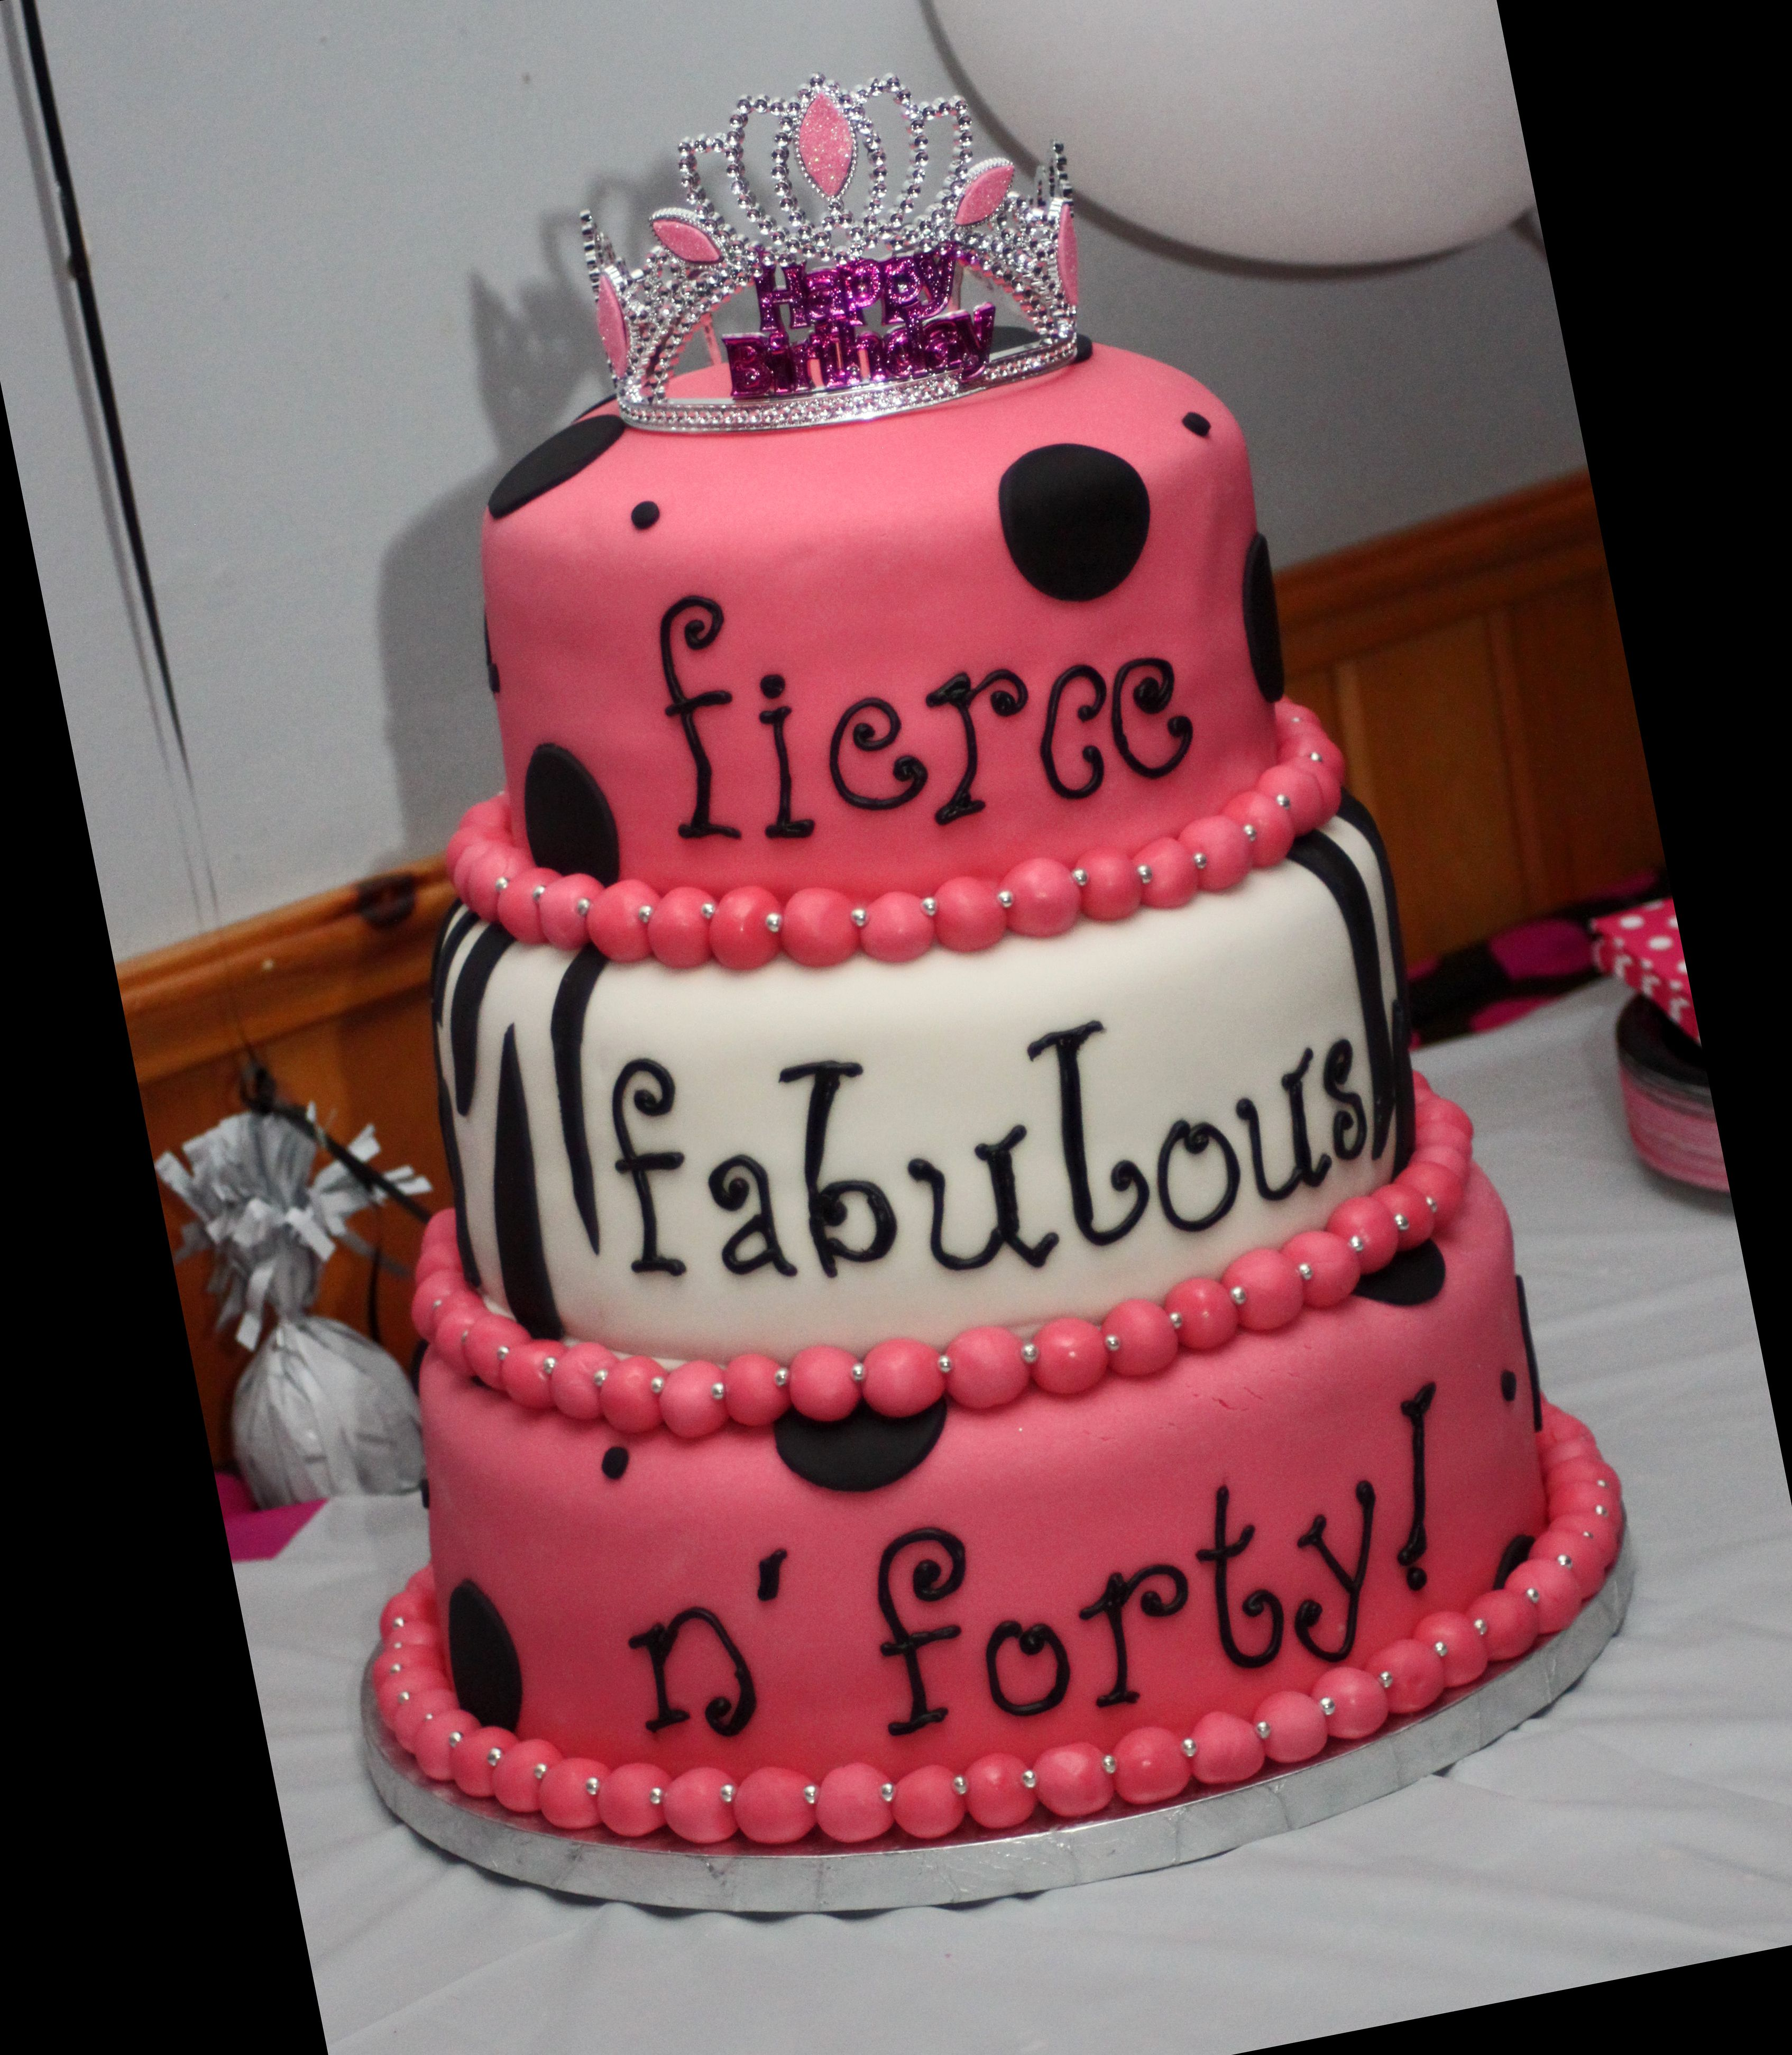 Cake Designs For 40th Birthday : My 40th birthday cake! My Fabulous 40th Pinterest